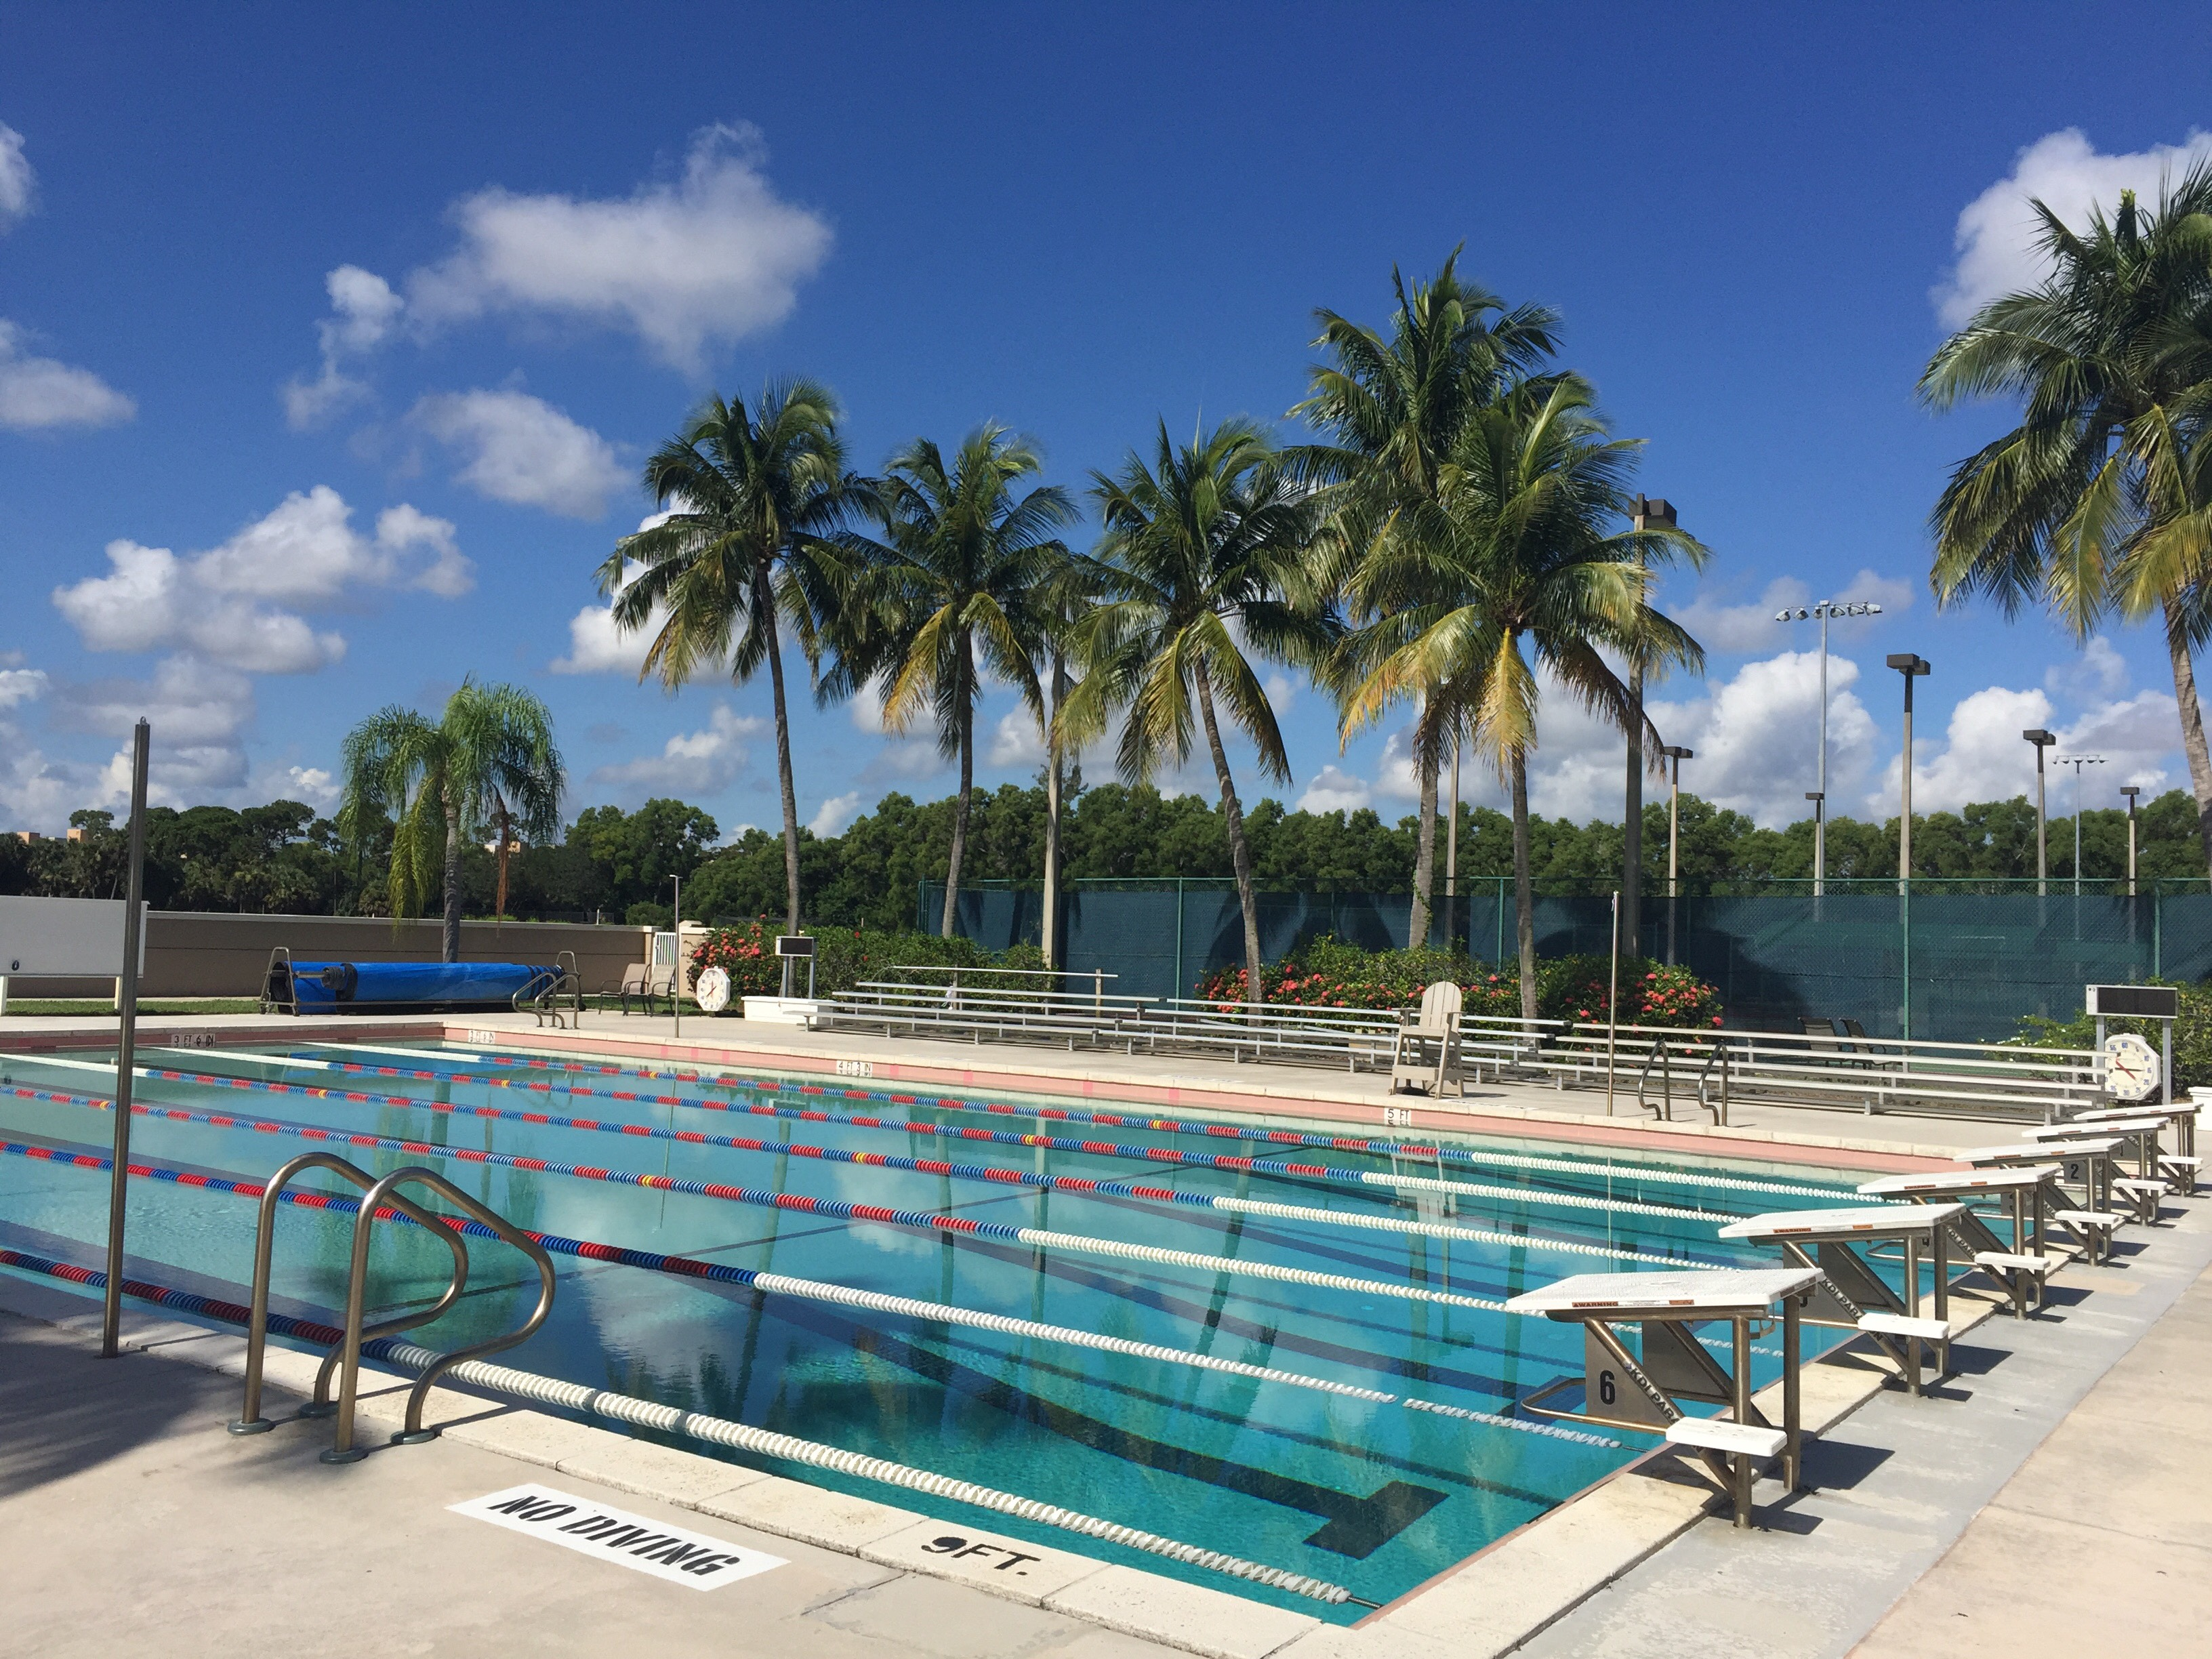 Swimming Pool Foundations : Swimming oxbridge academy foundation inc